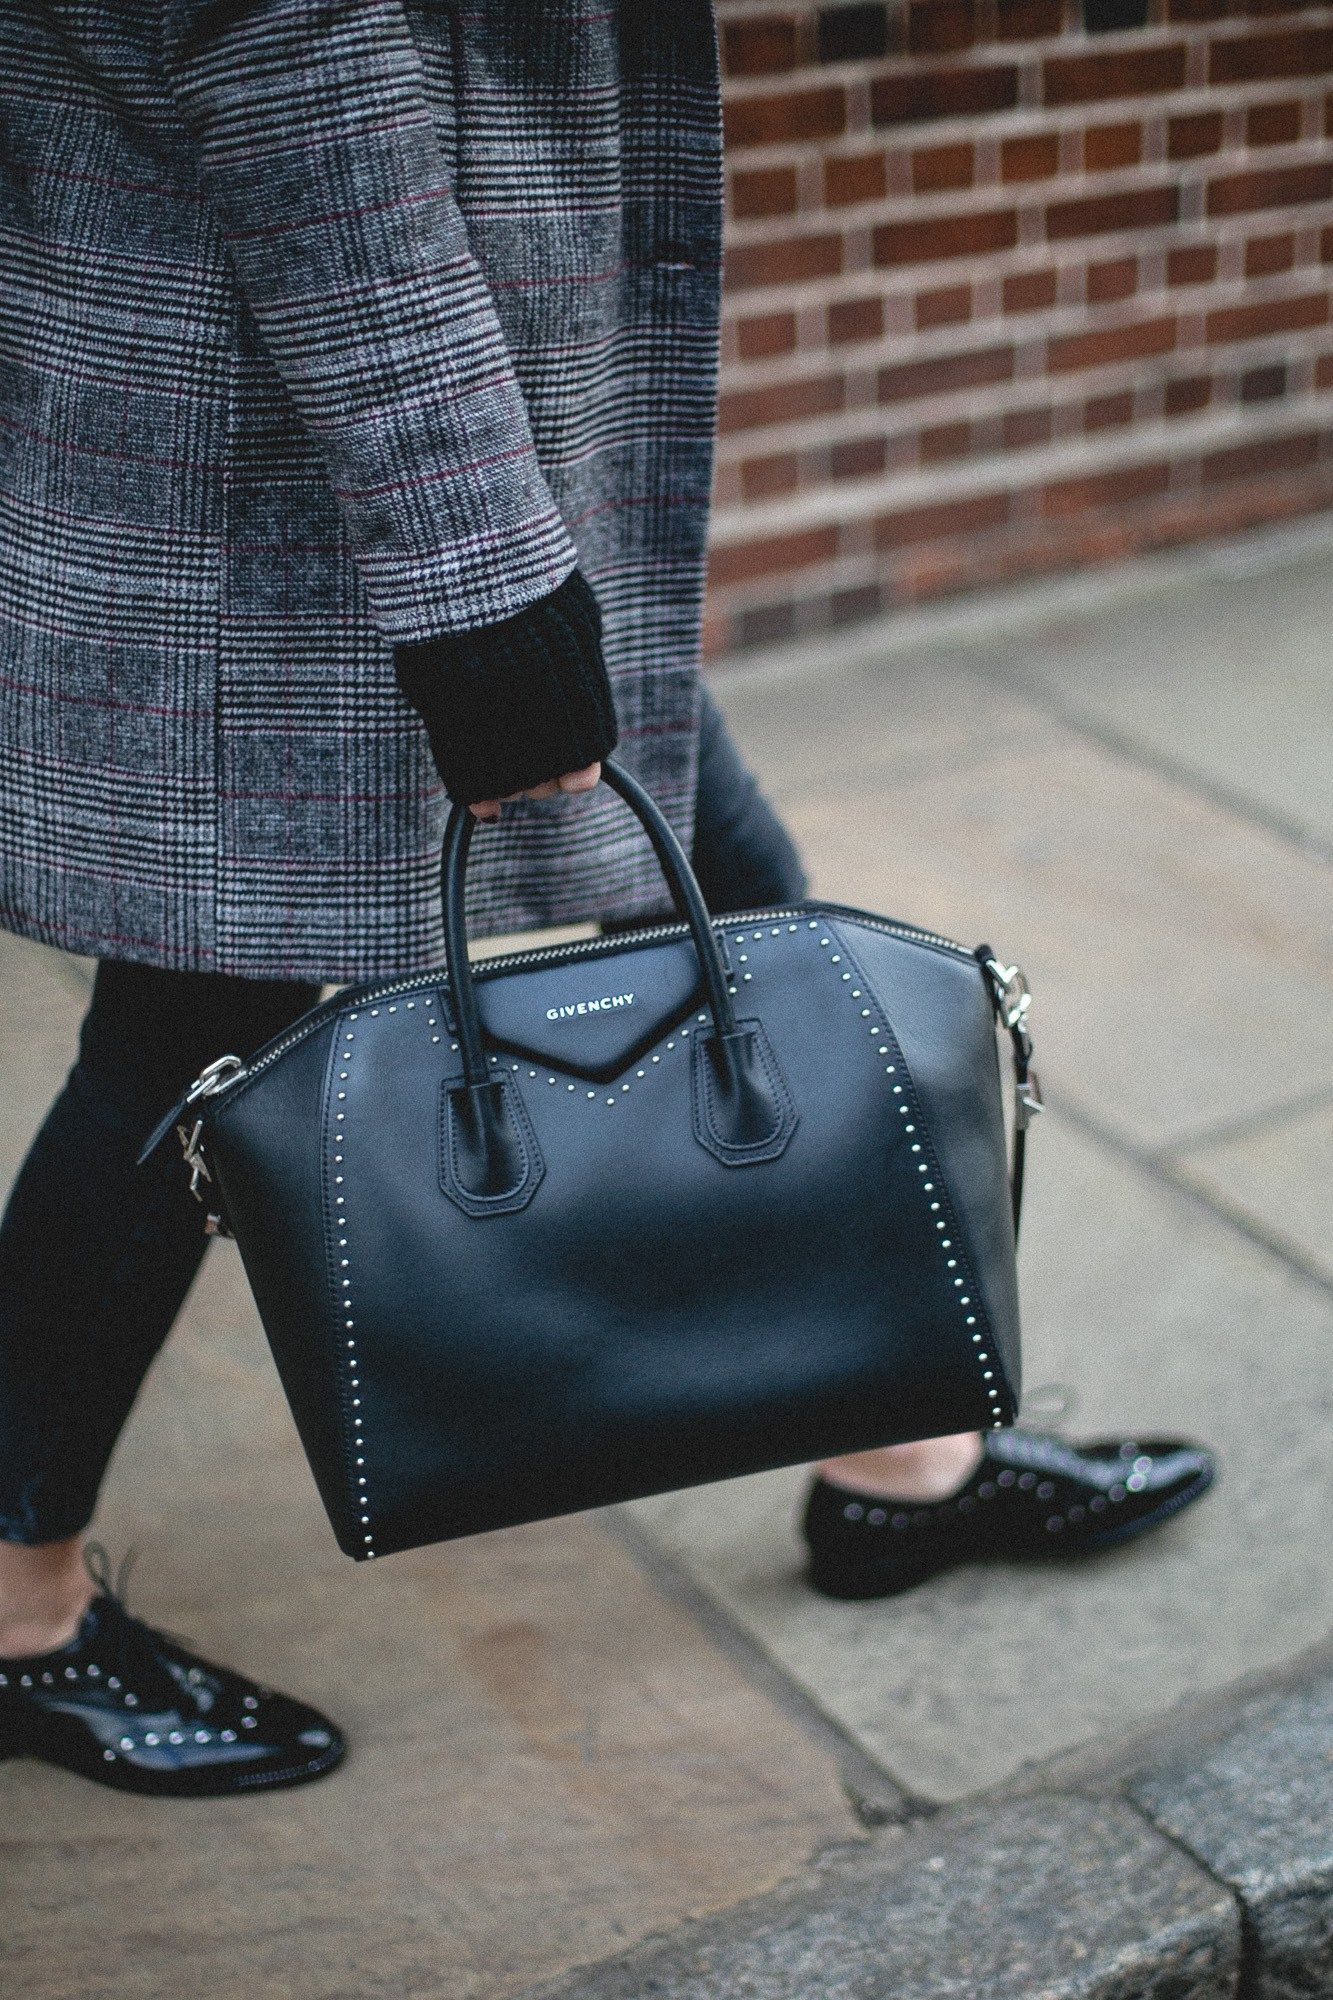 dcc269bd05976 Emma Hill wears Givenchy medium Antigona bag with studs